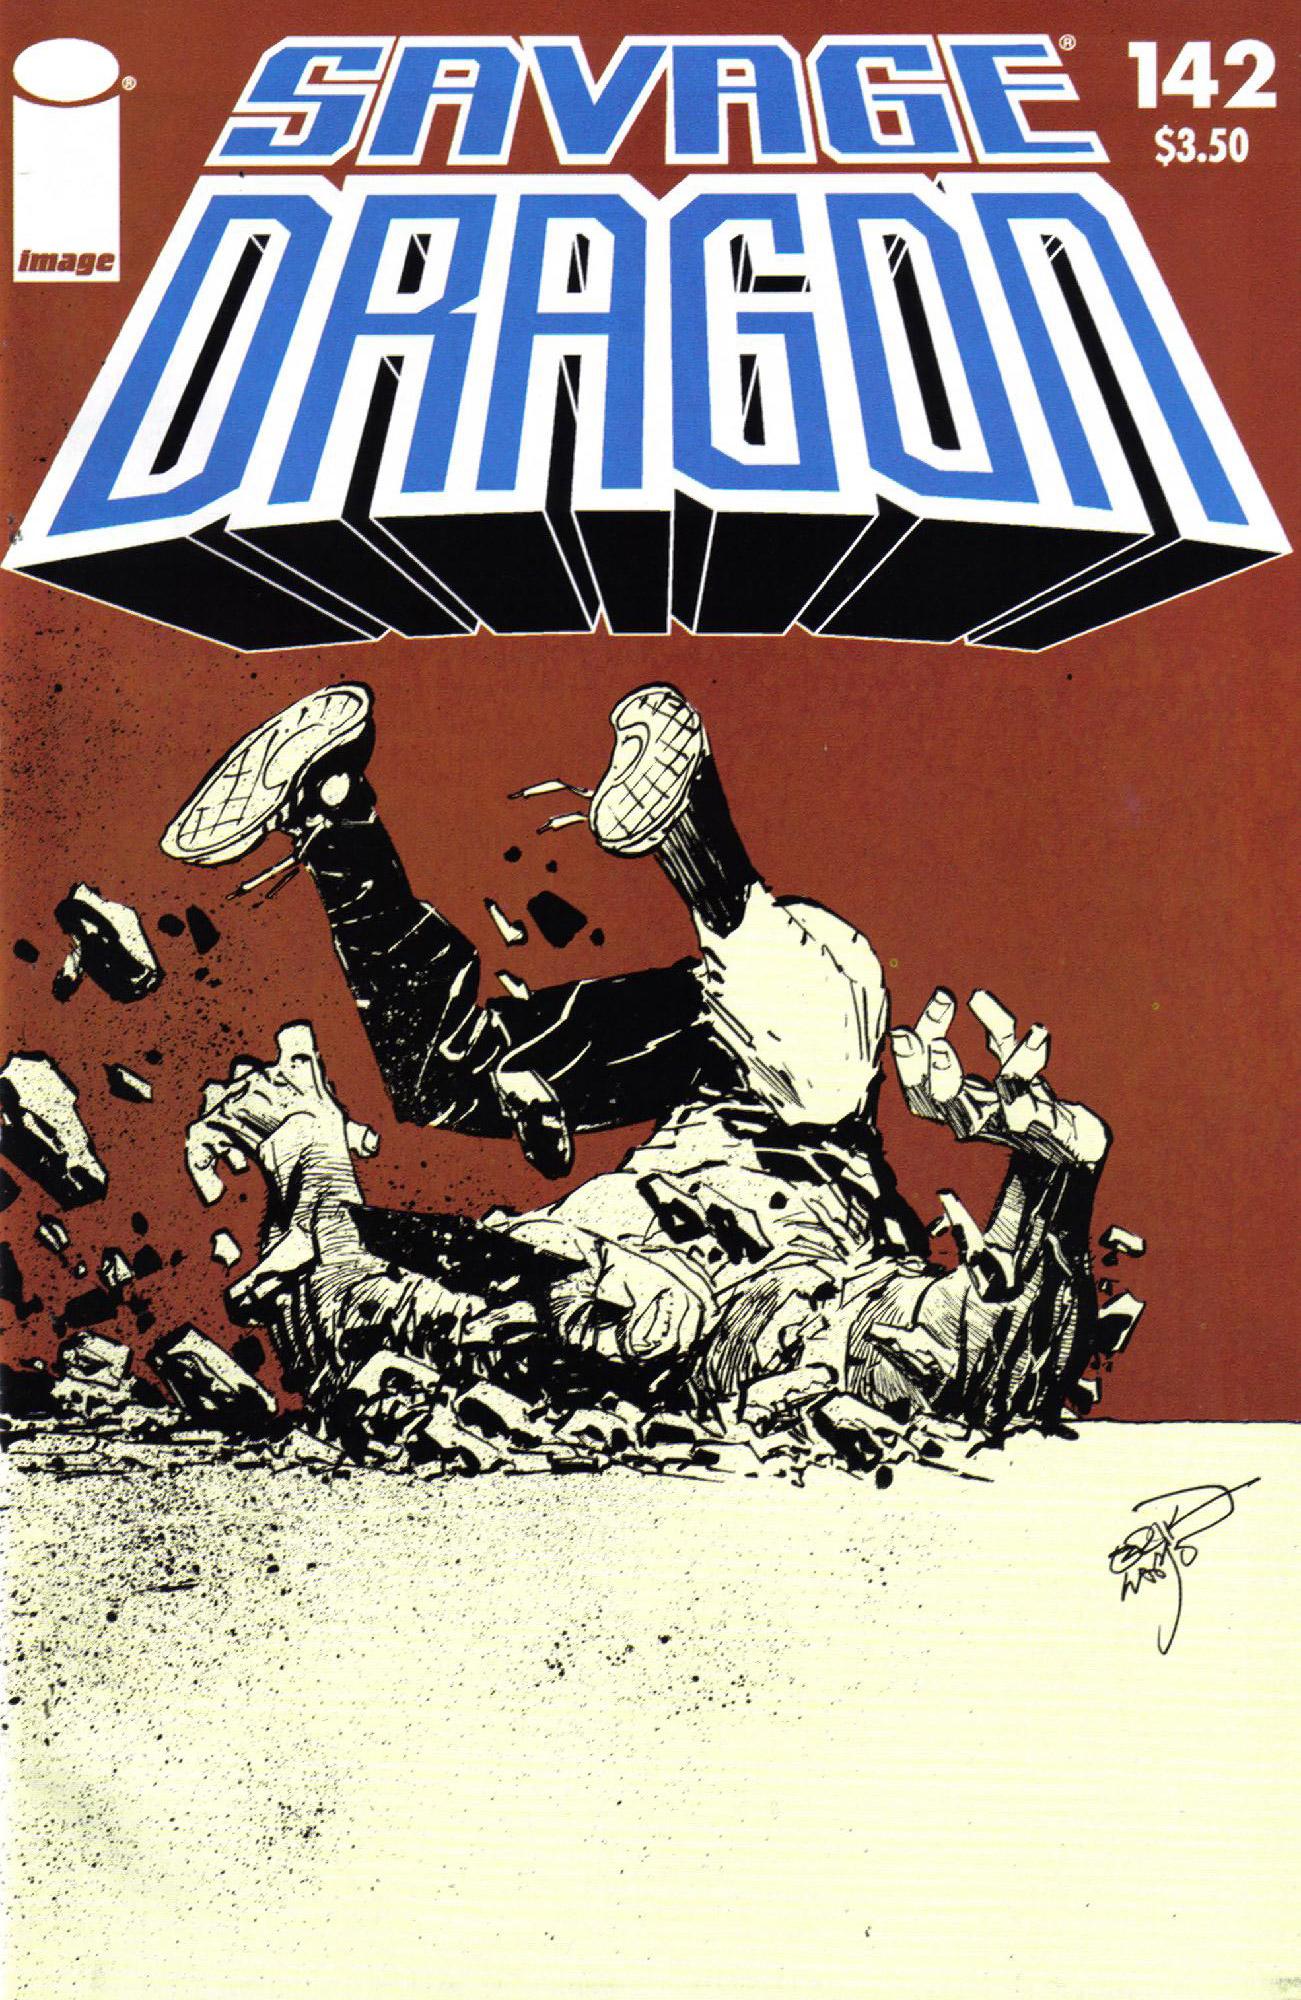 Cover Savage Dragon Vol.2 #142